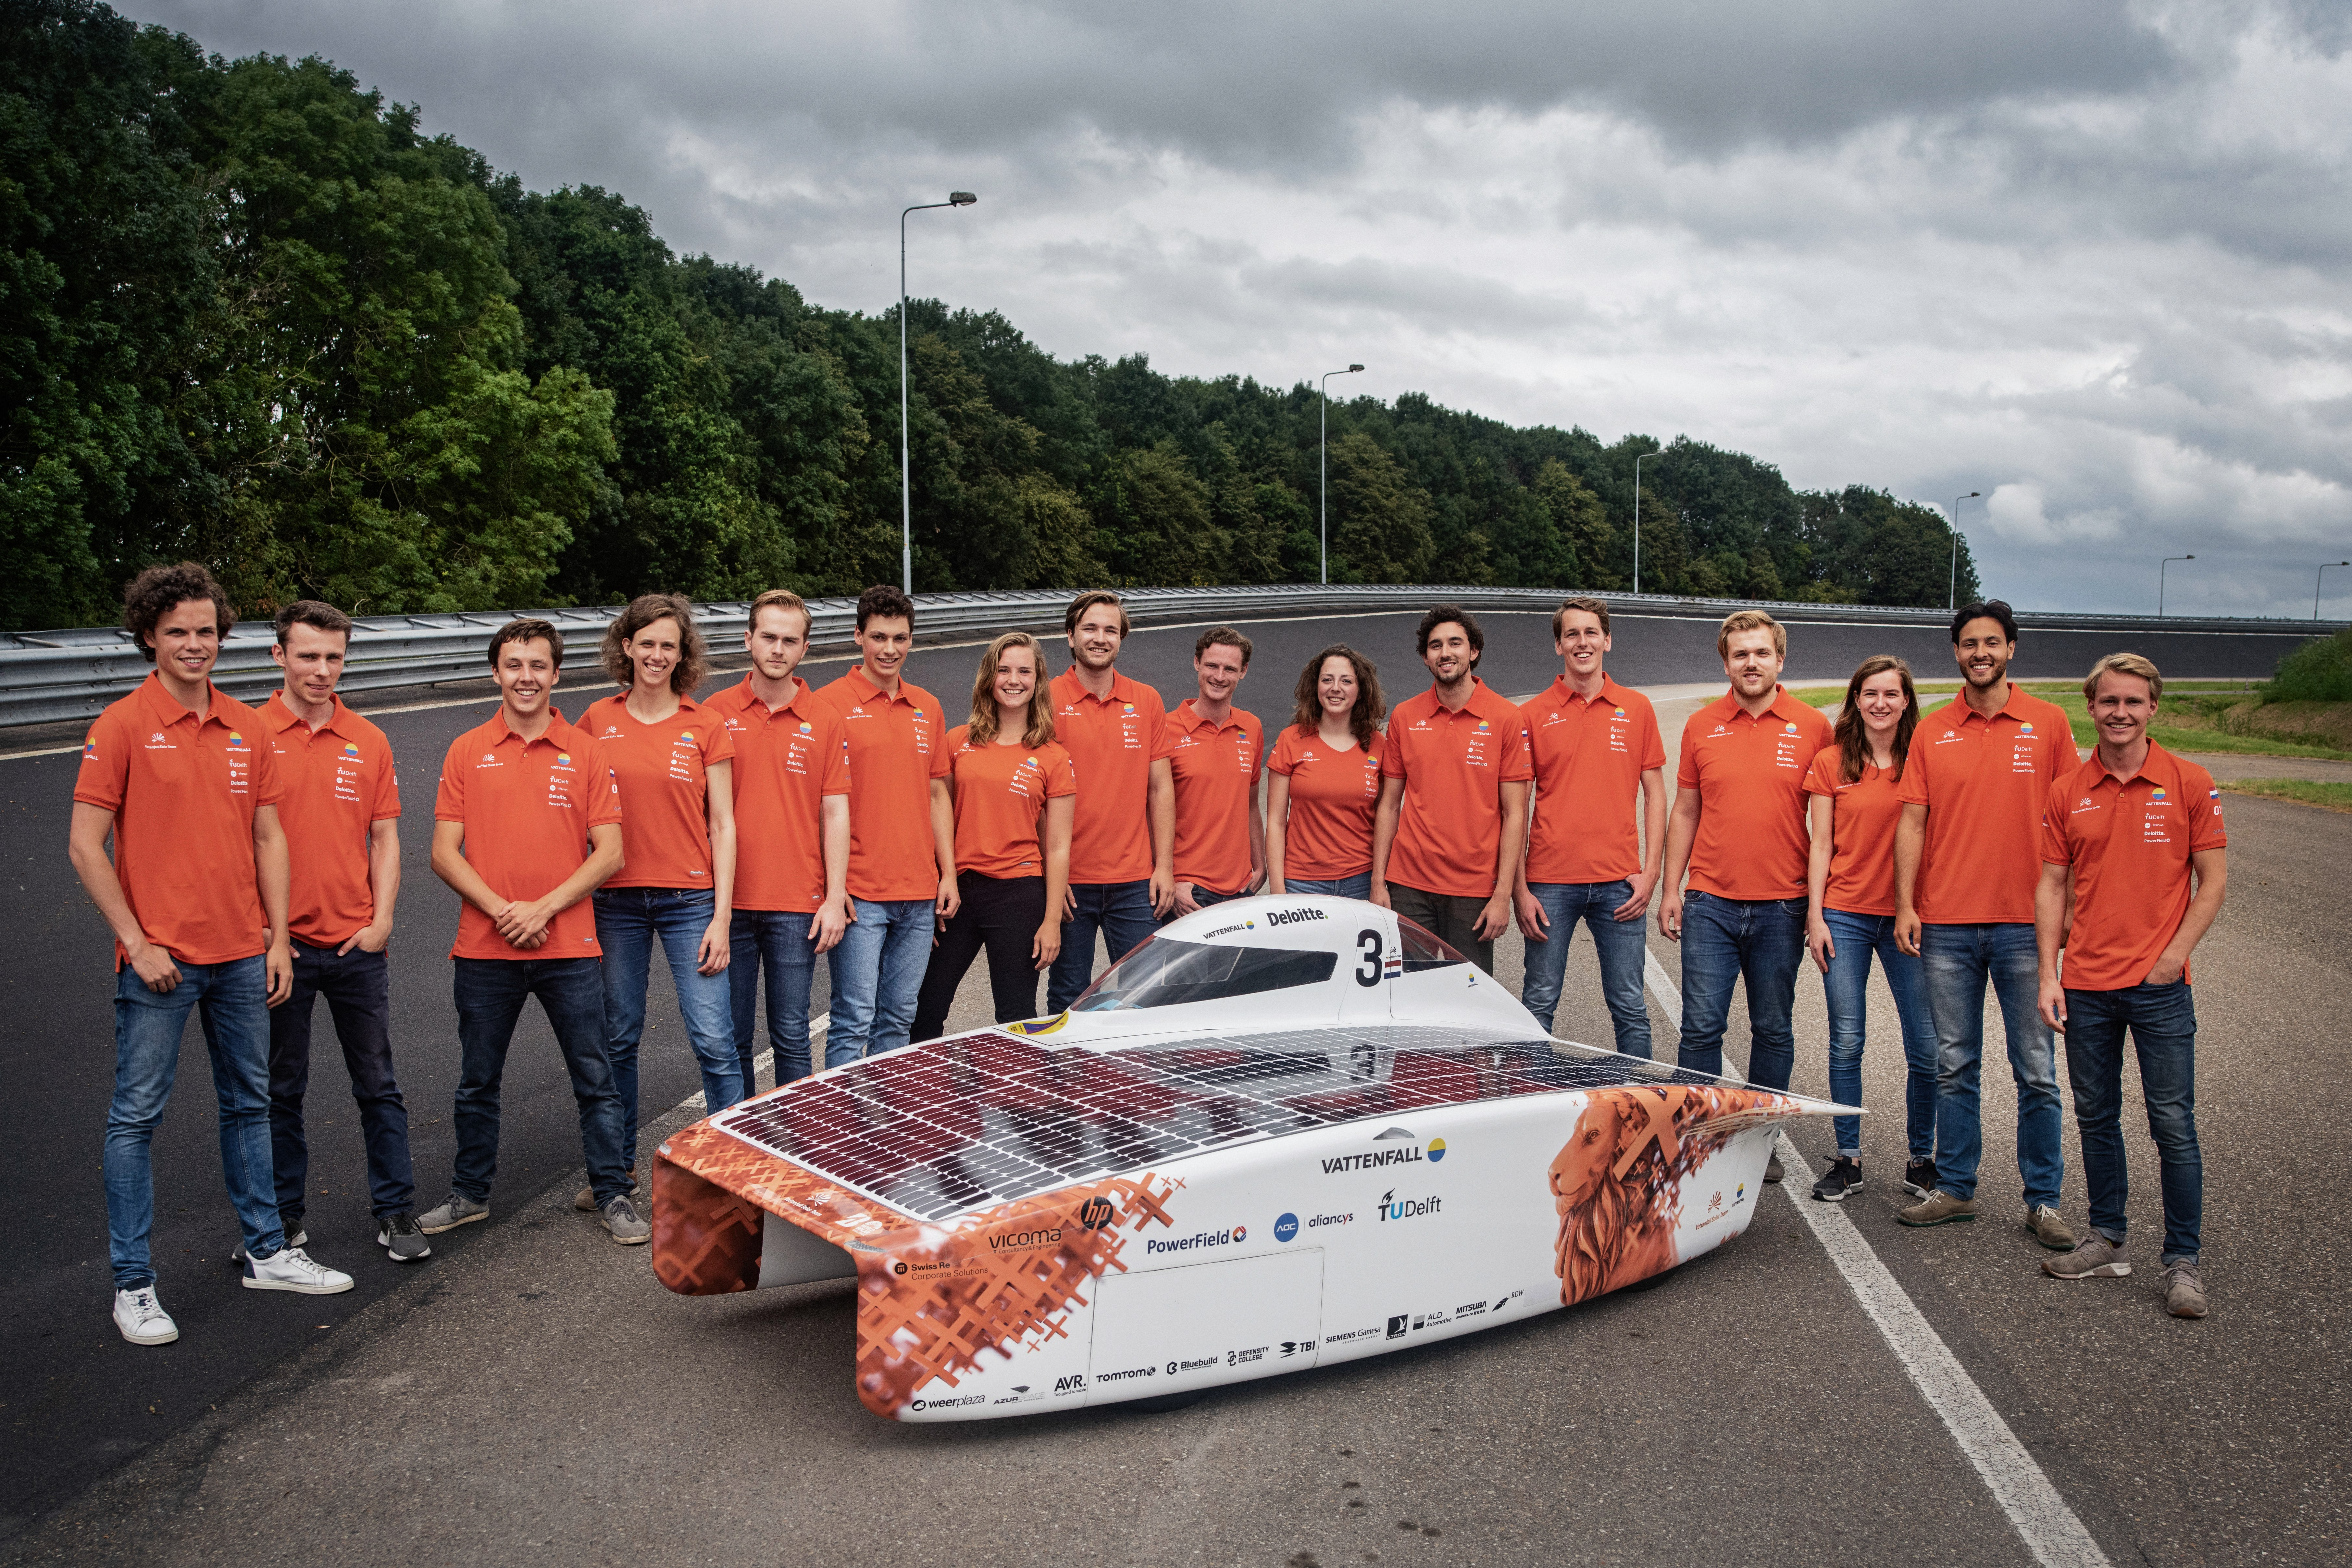 Vattenfall Solar Team, zonneauto, NunaX, TU Delft